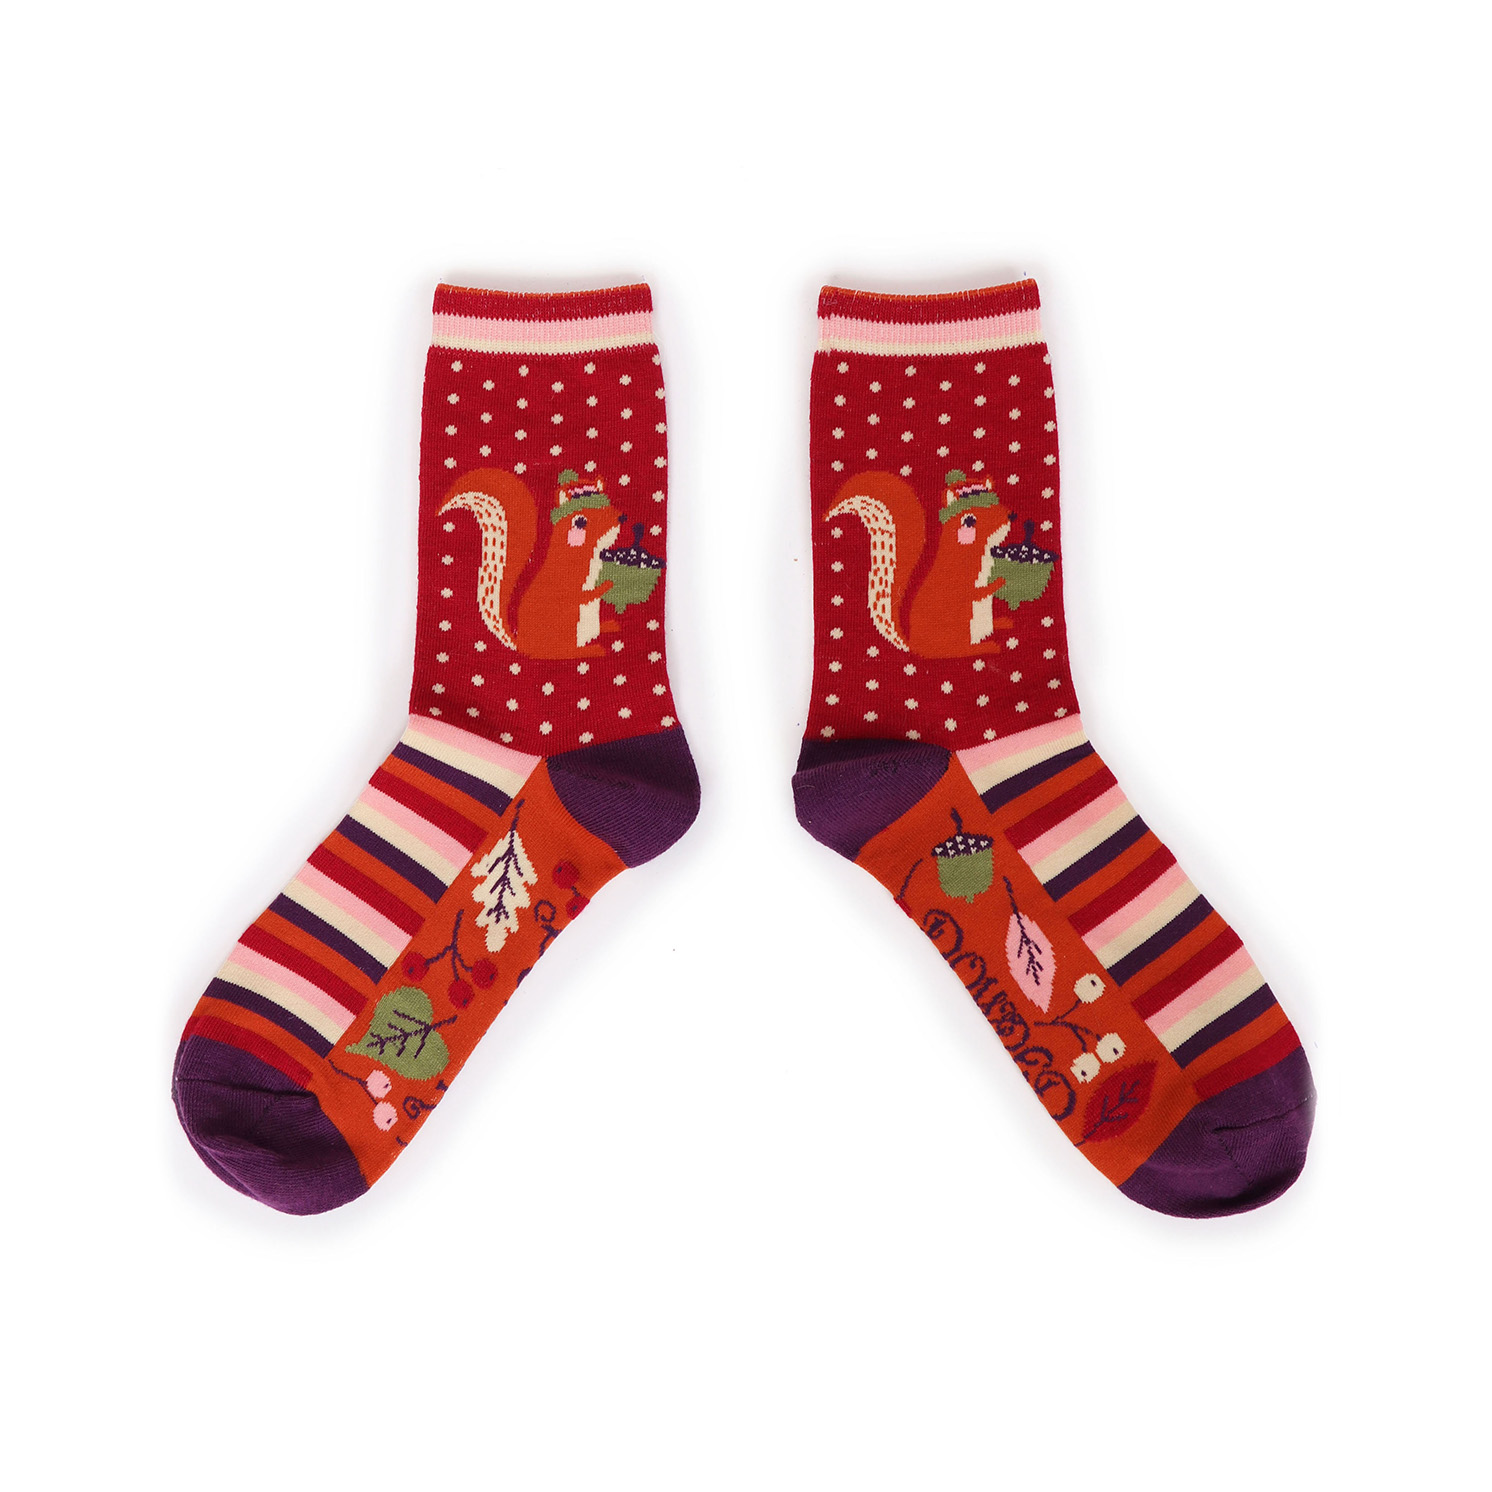 Powder – Fuchsia Pink Nutty Squirrel Ankle Socks with Presentation Gift Bag